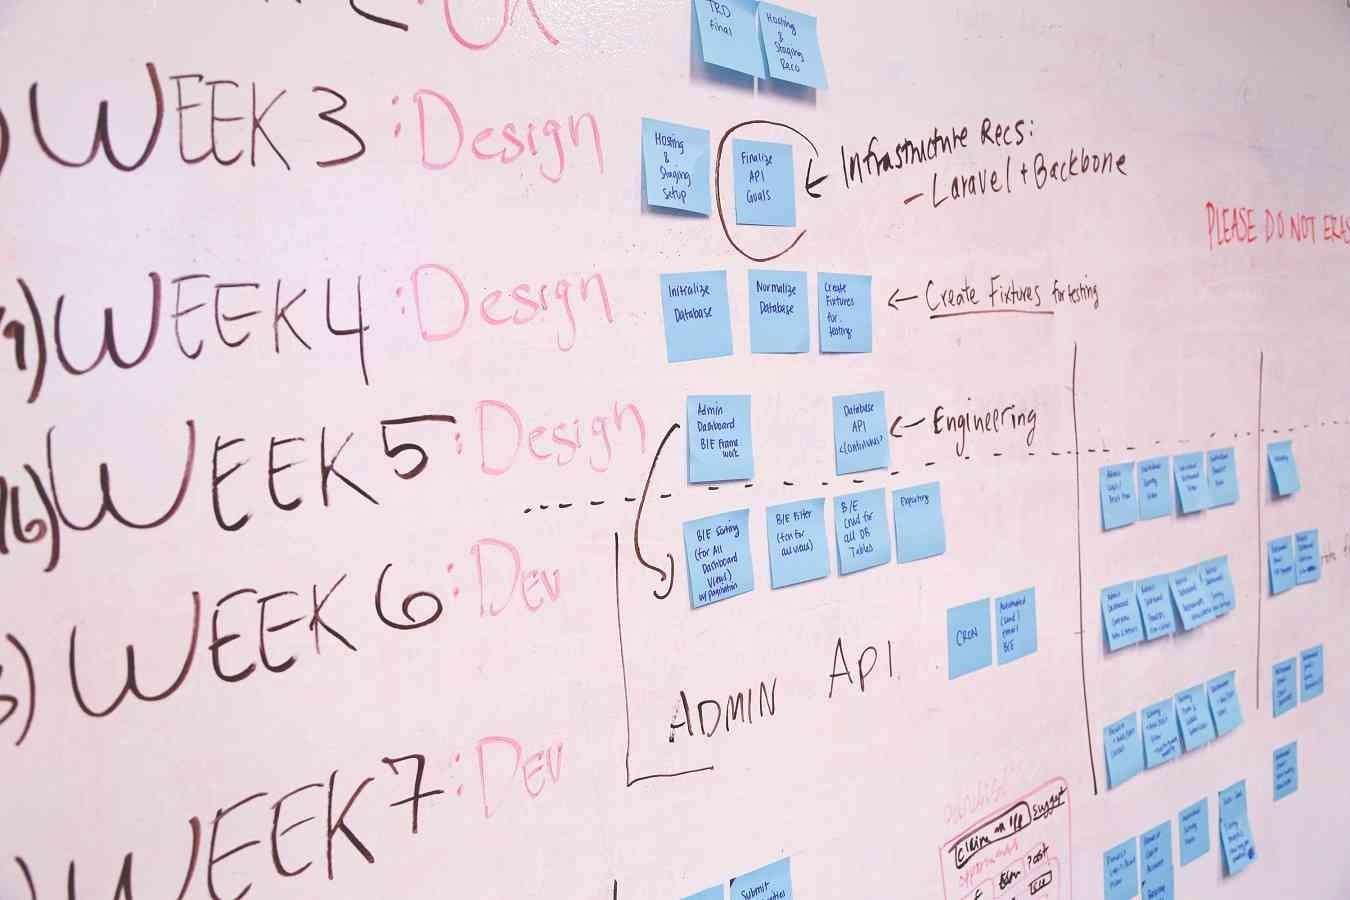 schedule task